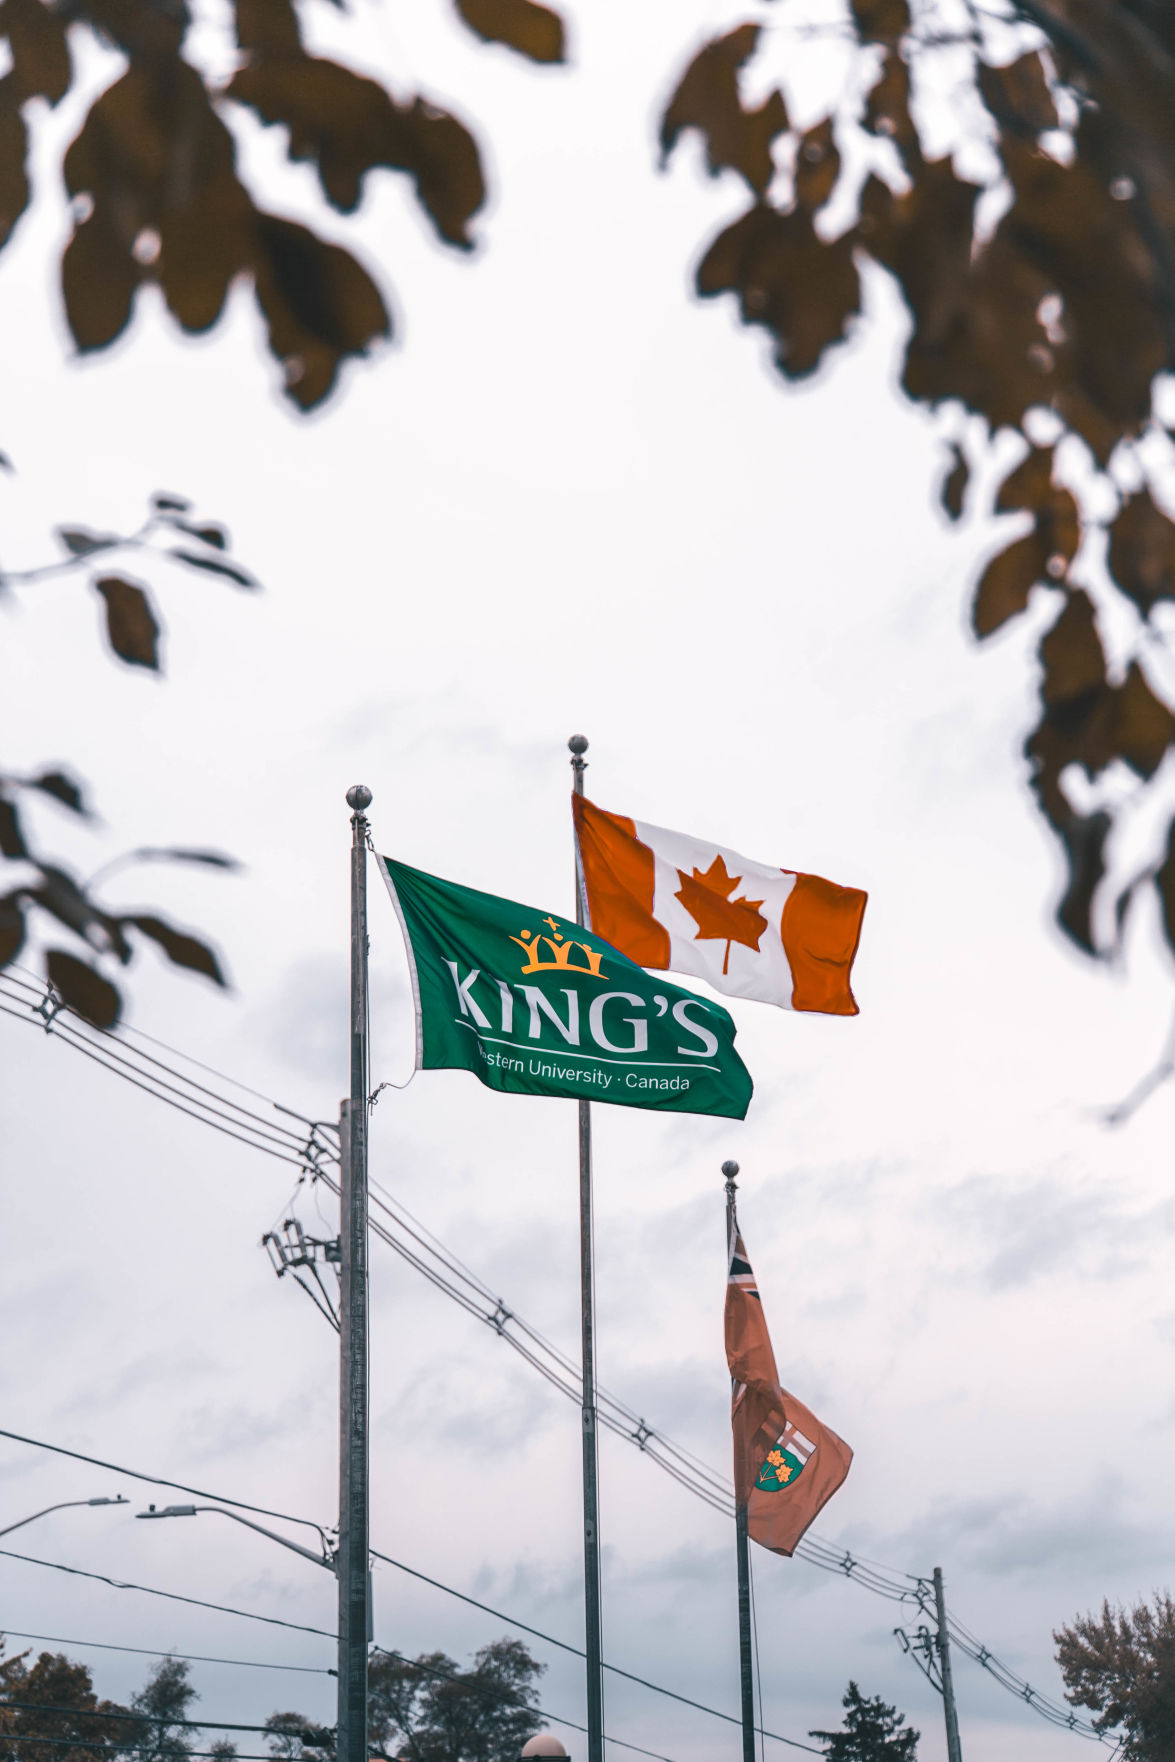 King' University College (Photo 2)